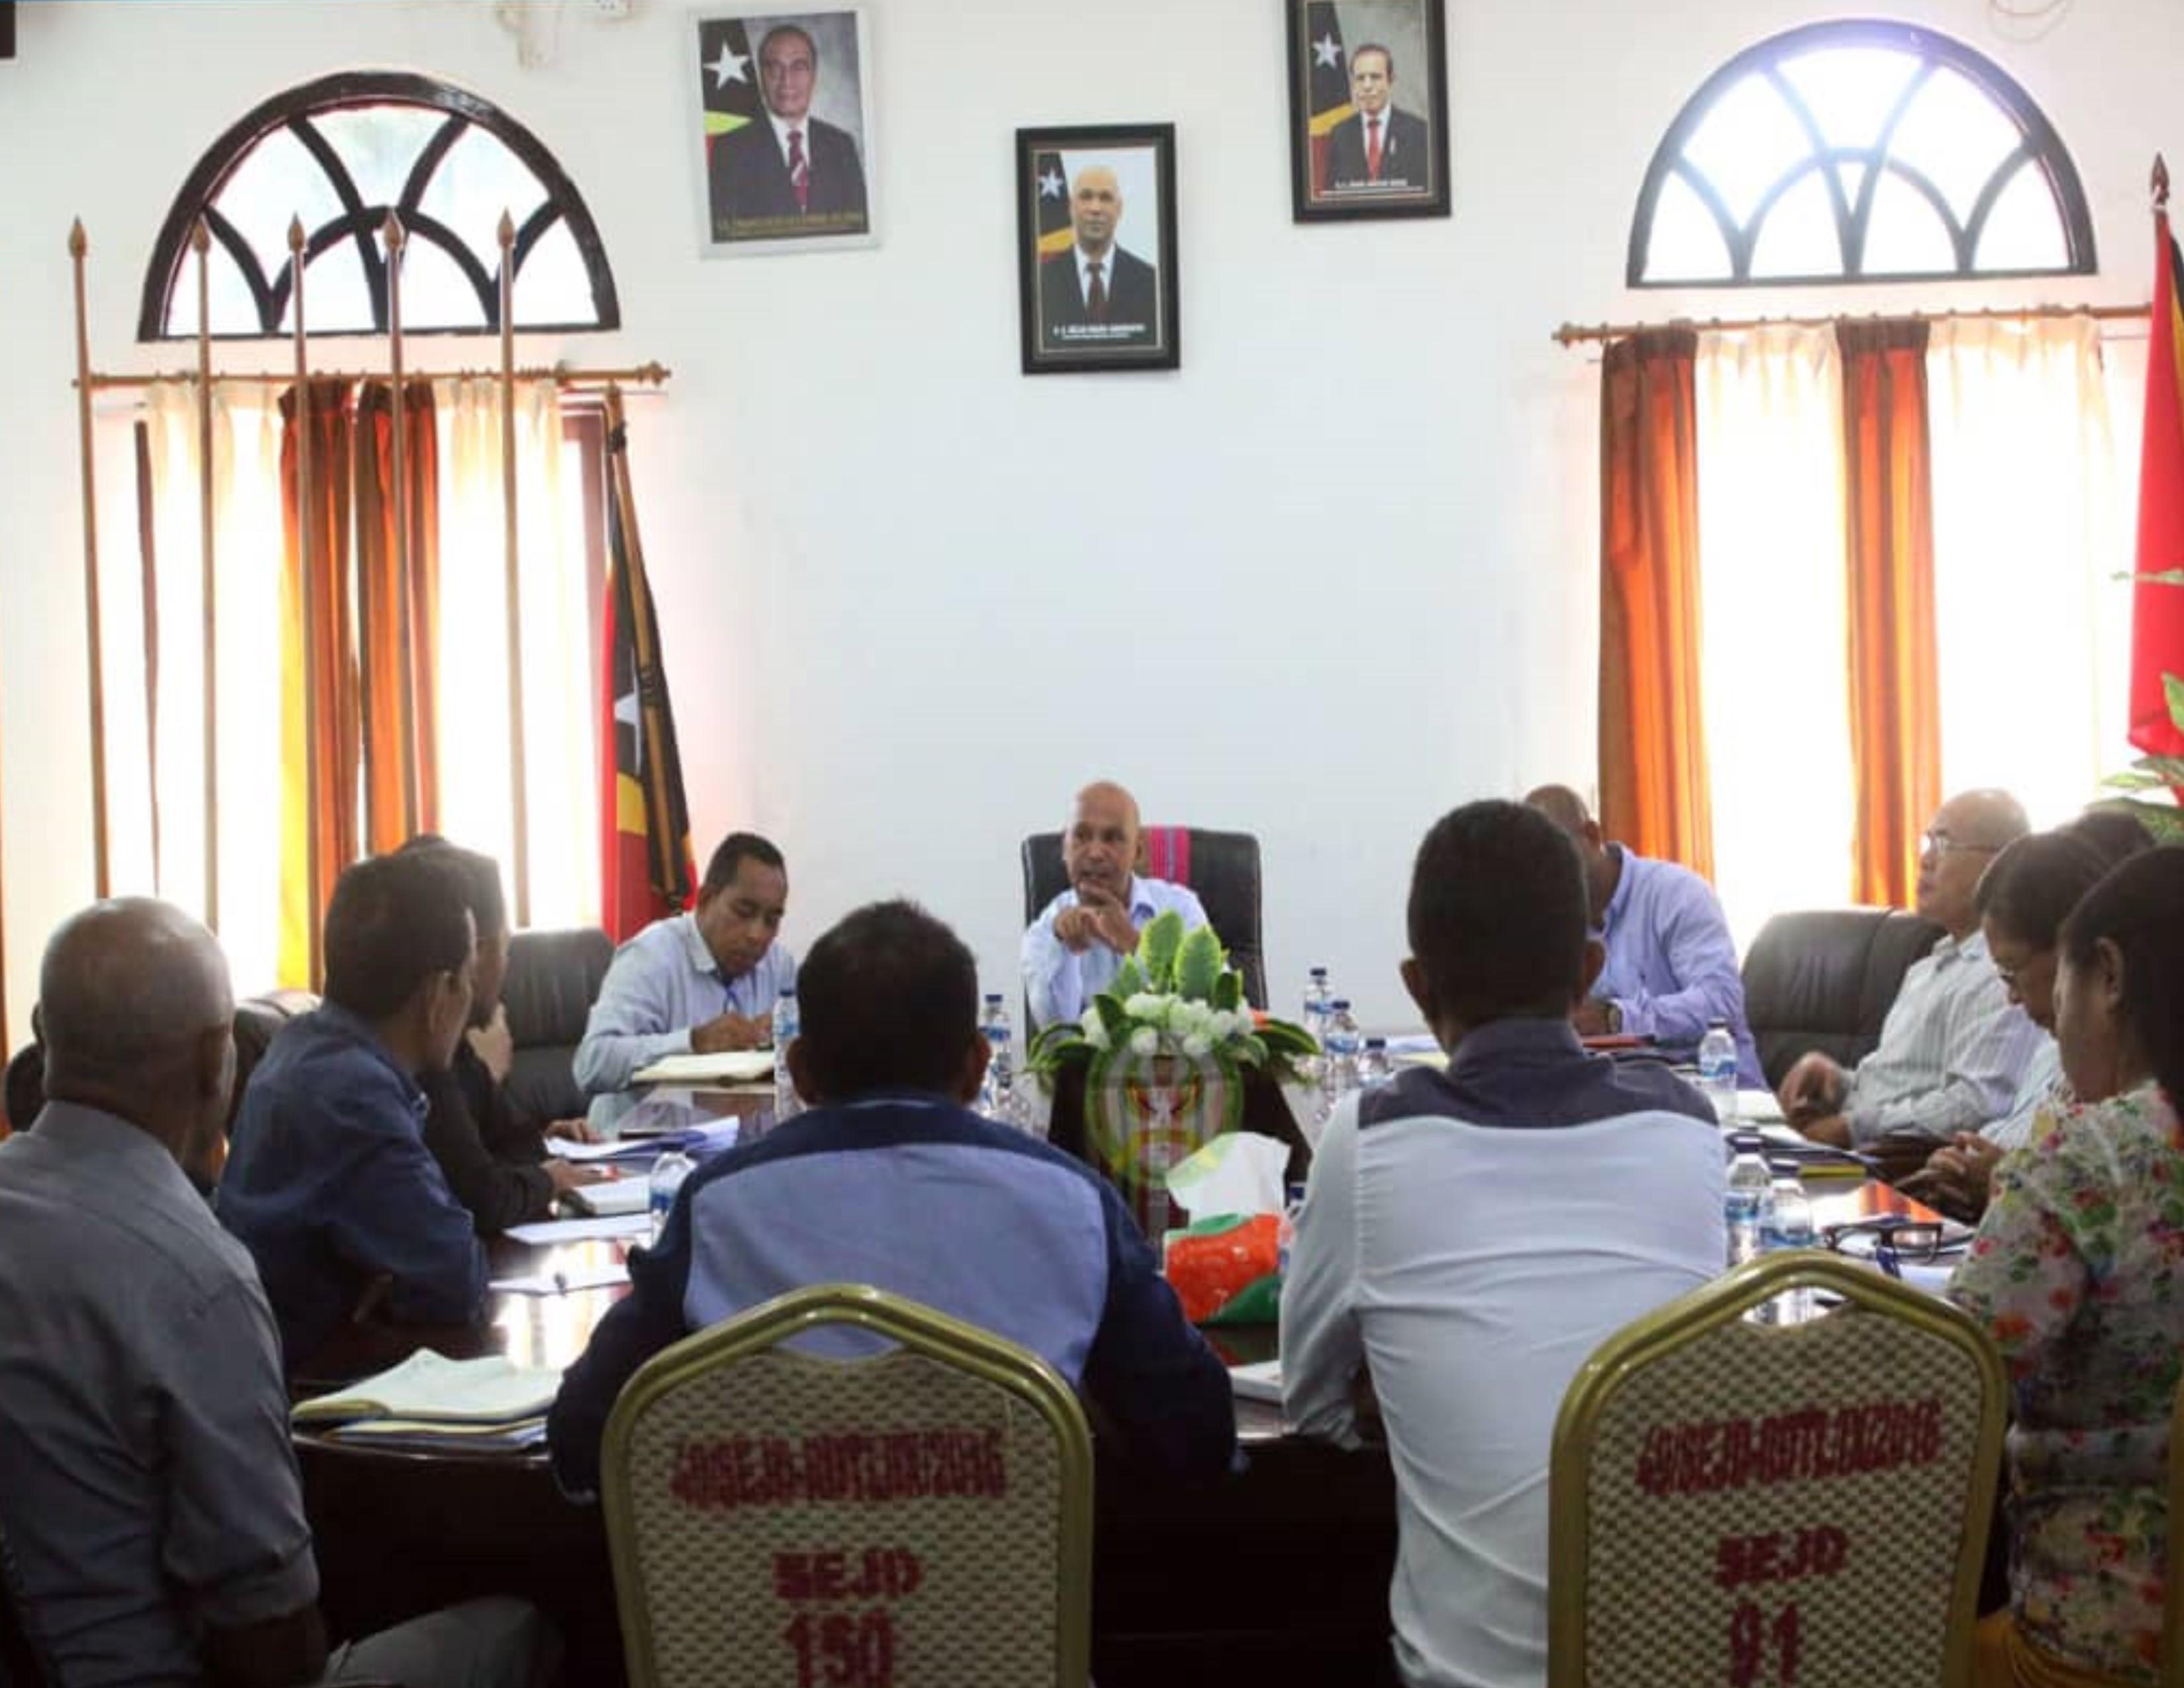 SEJD  reuniaun hamutuk ho lina ministeriais sira ba preparasaun jogu CPLP iha fulan jullu 2020